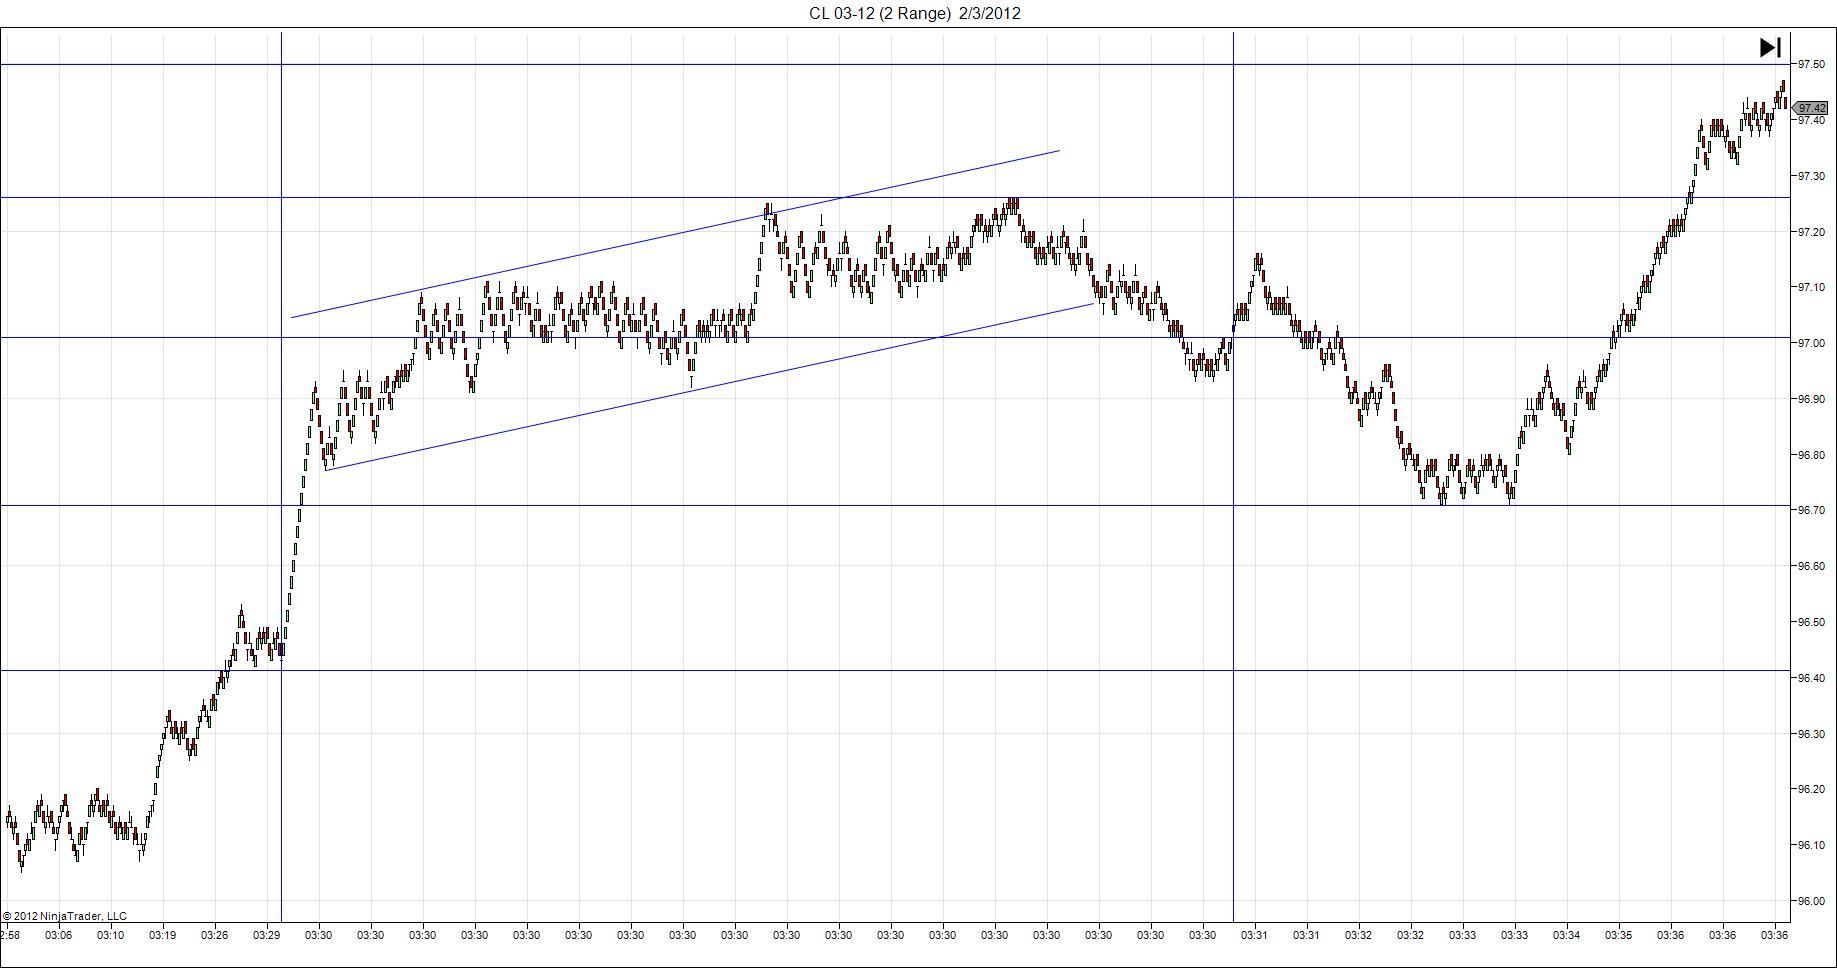 CL 03 12 (2 Range) 02.03.12